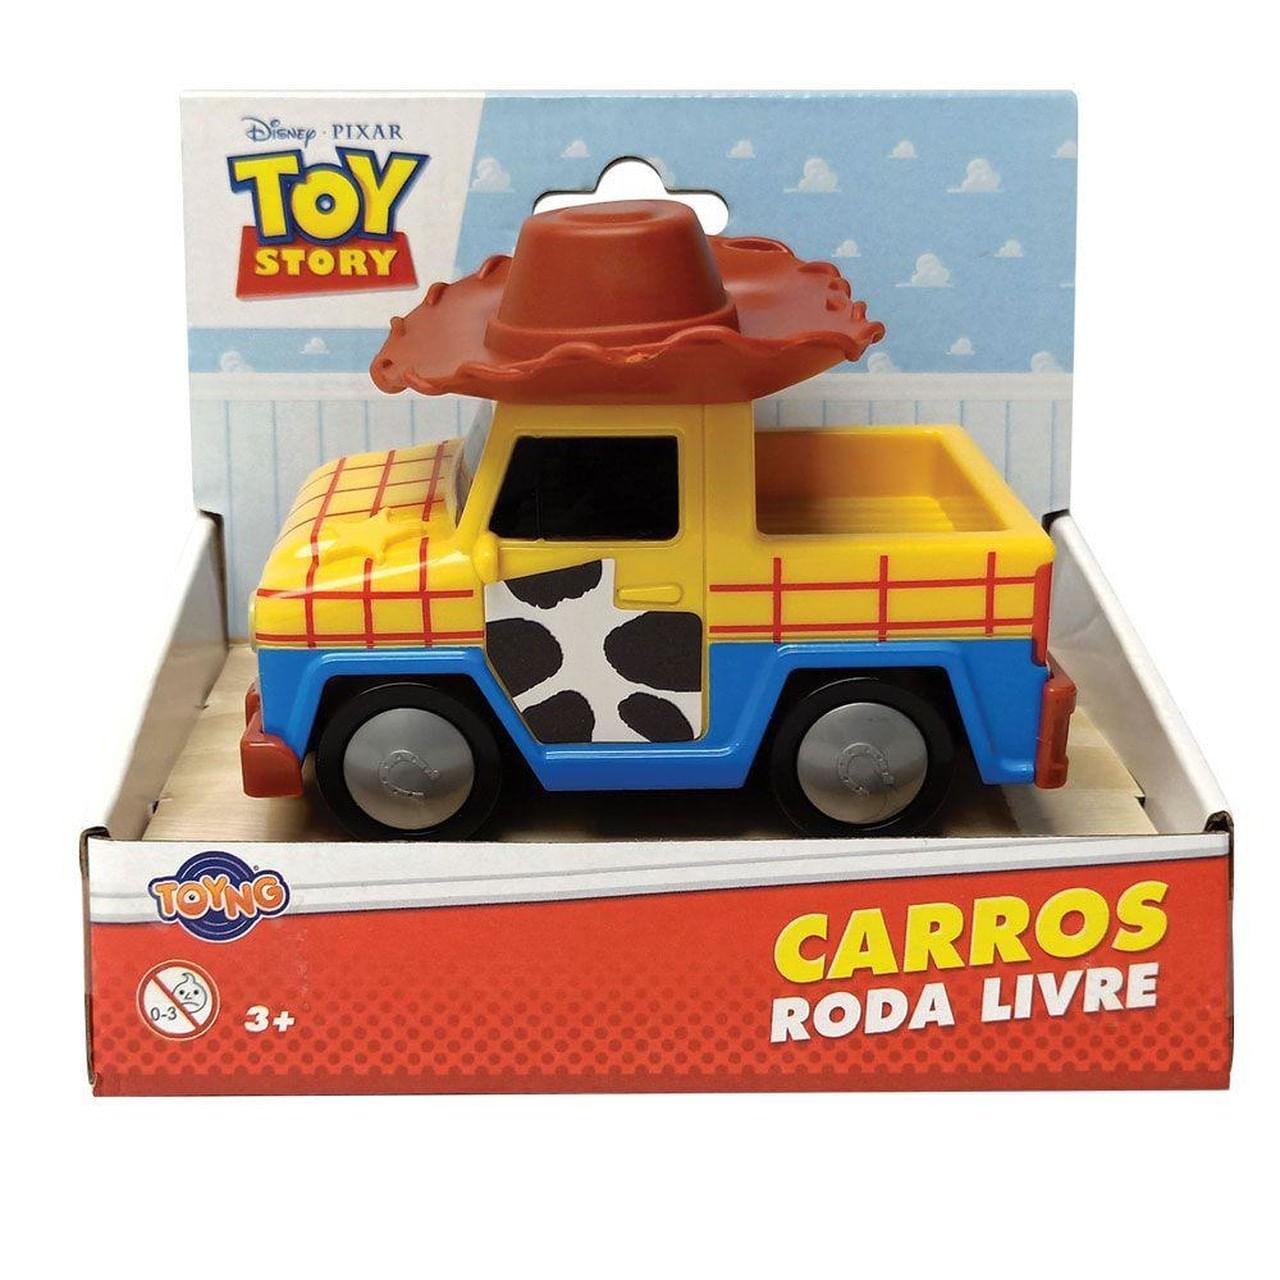 Carro Toy Story 4 - Woody - Roda Livre - Disney Pixar Toyng